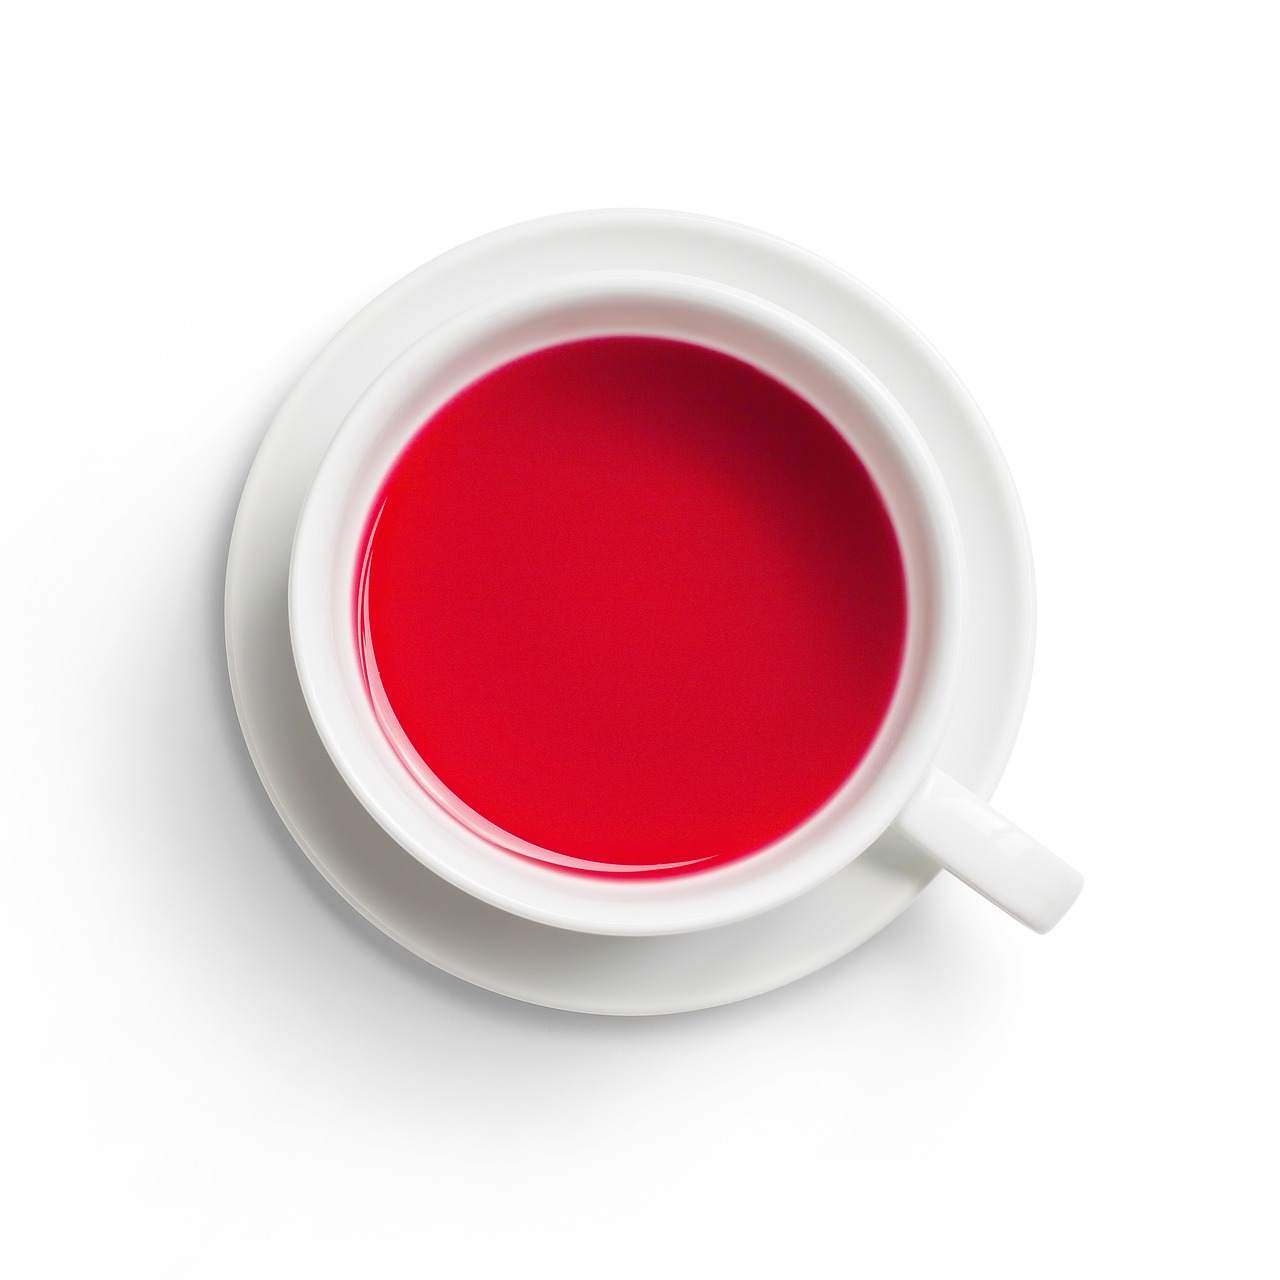 Hibiscus Tea and Pregnancy